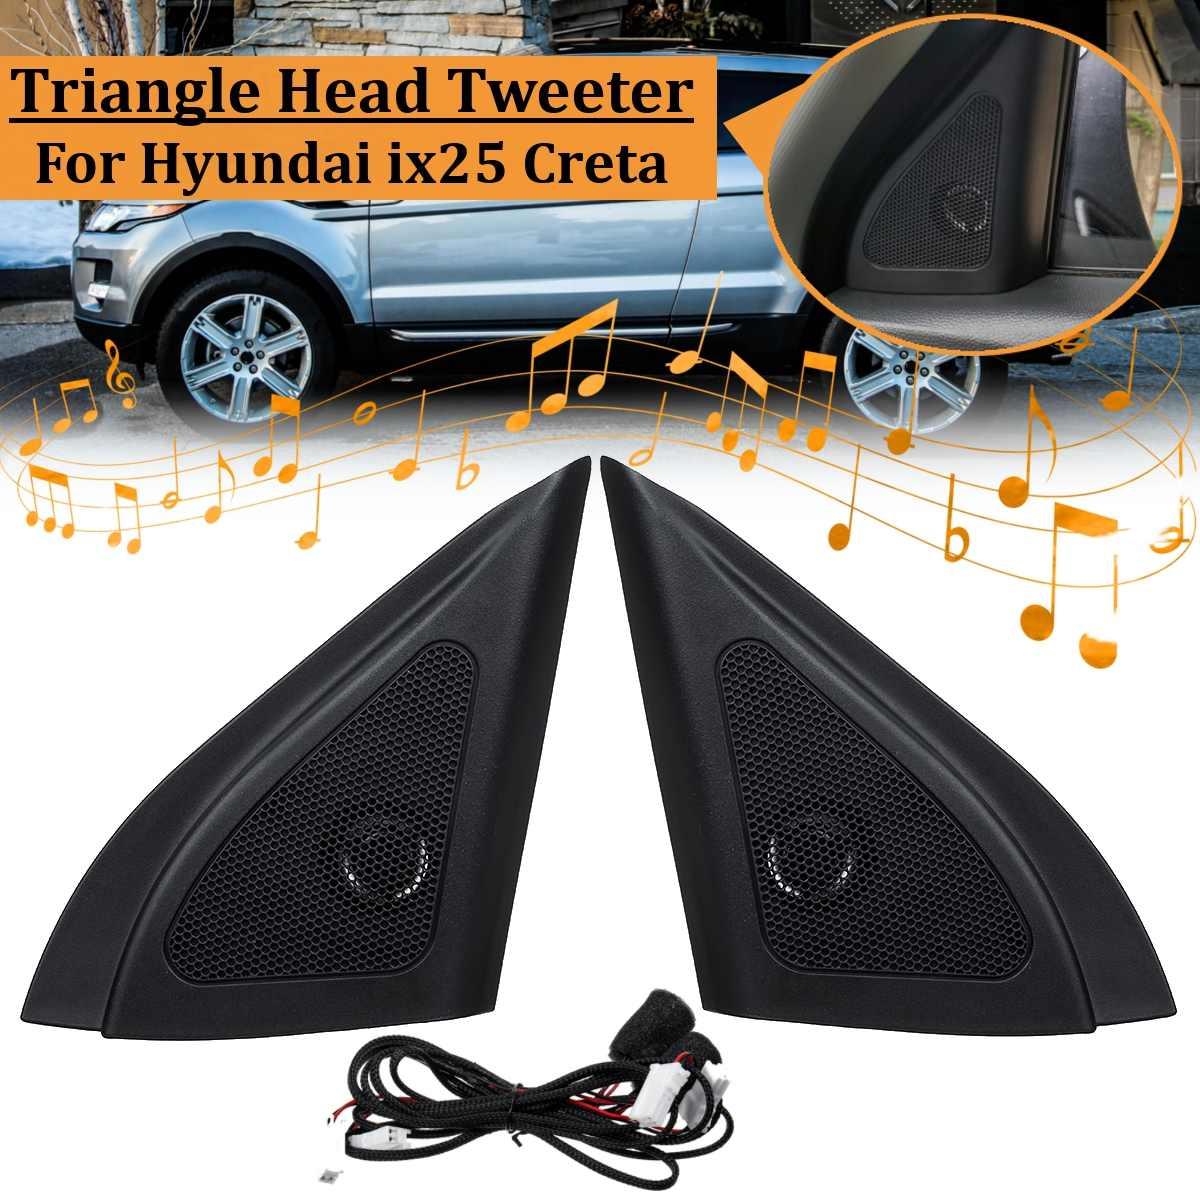 87650C9020 Pair Front Triangle Head Tweeter Althorn Speaker with Wire Audio trumpet head speaker For Hyundai ix25 for CRETA